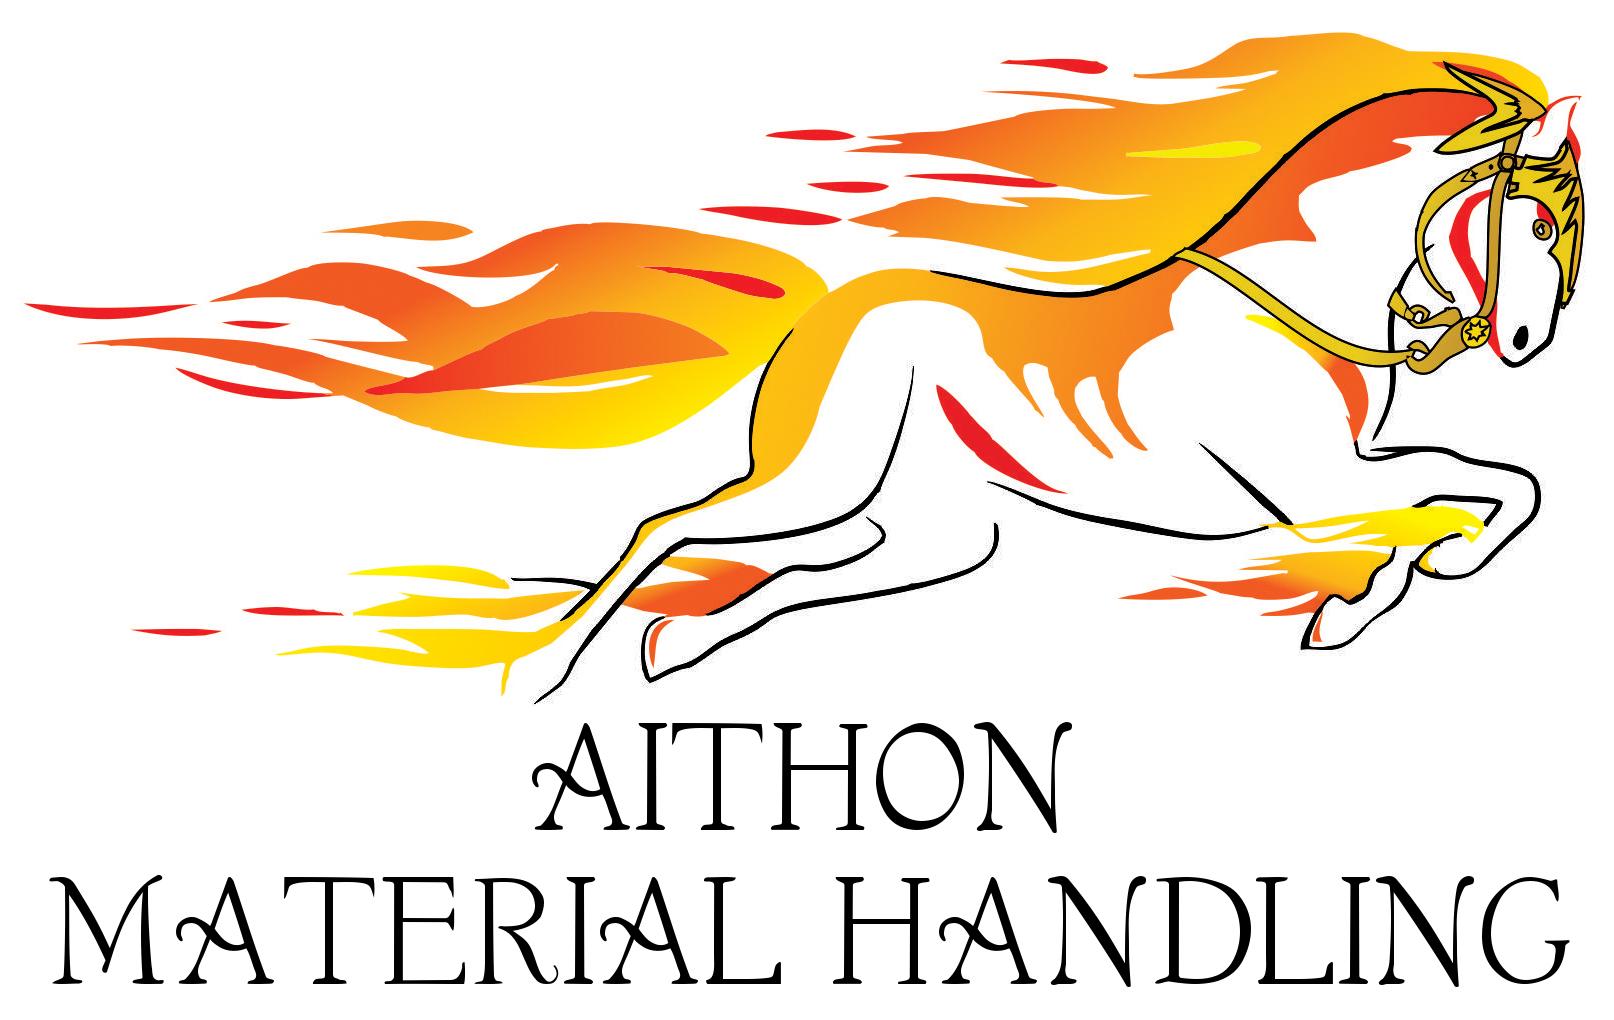 Aithon Material Handling